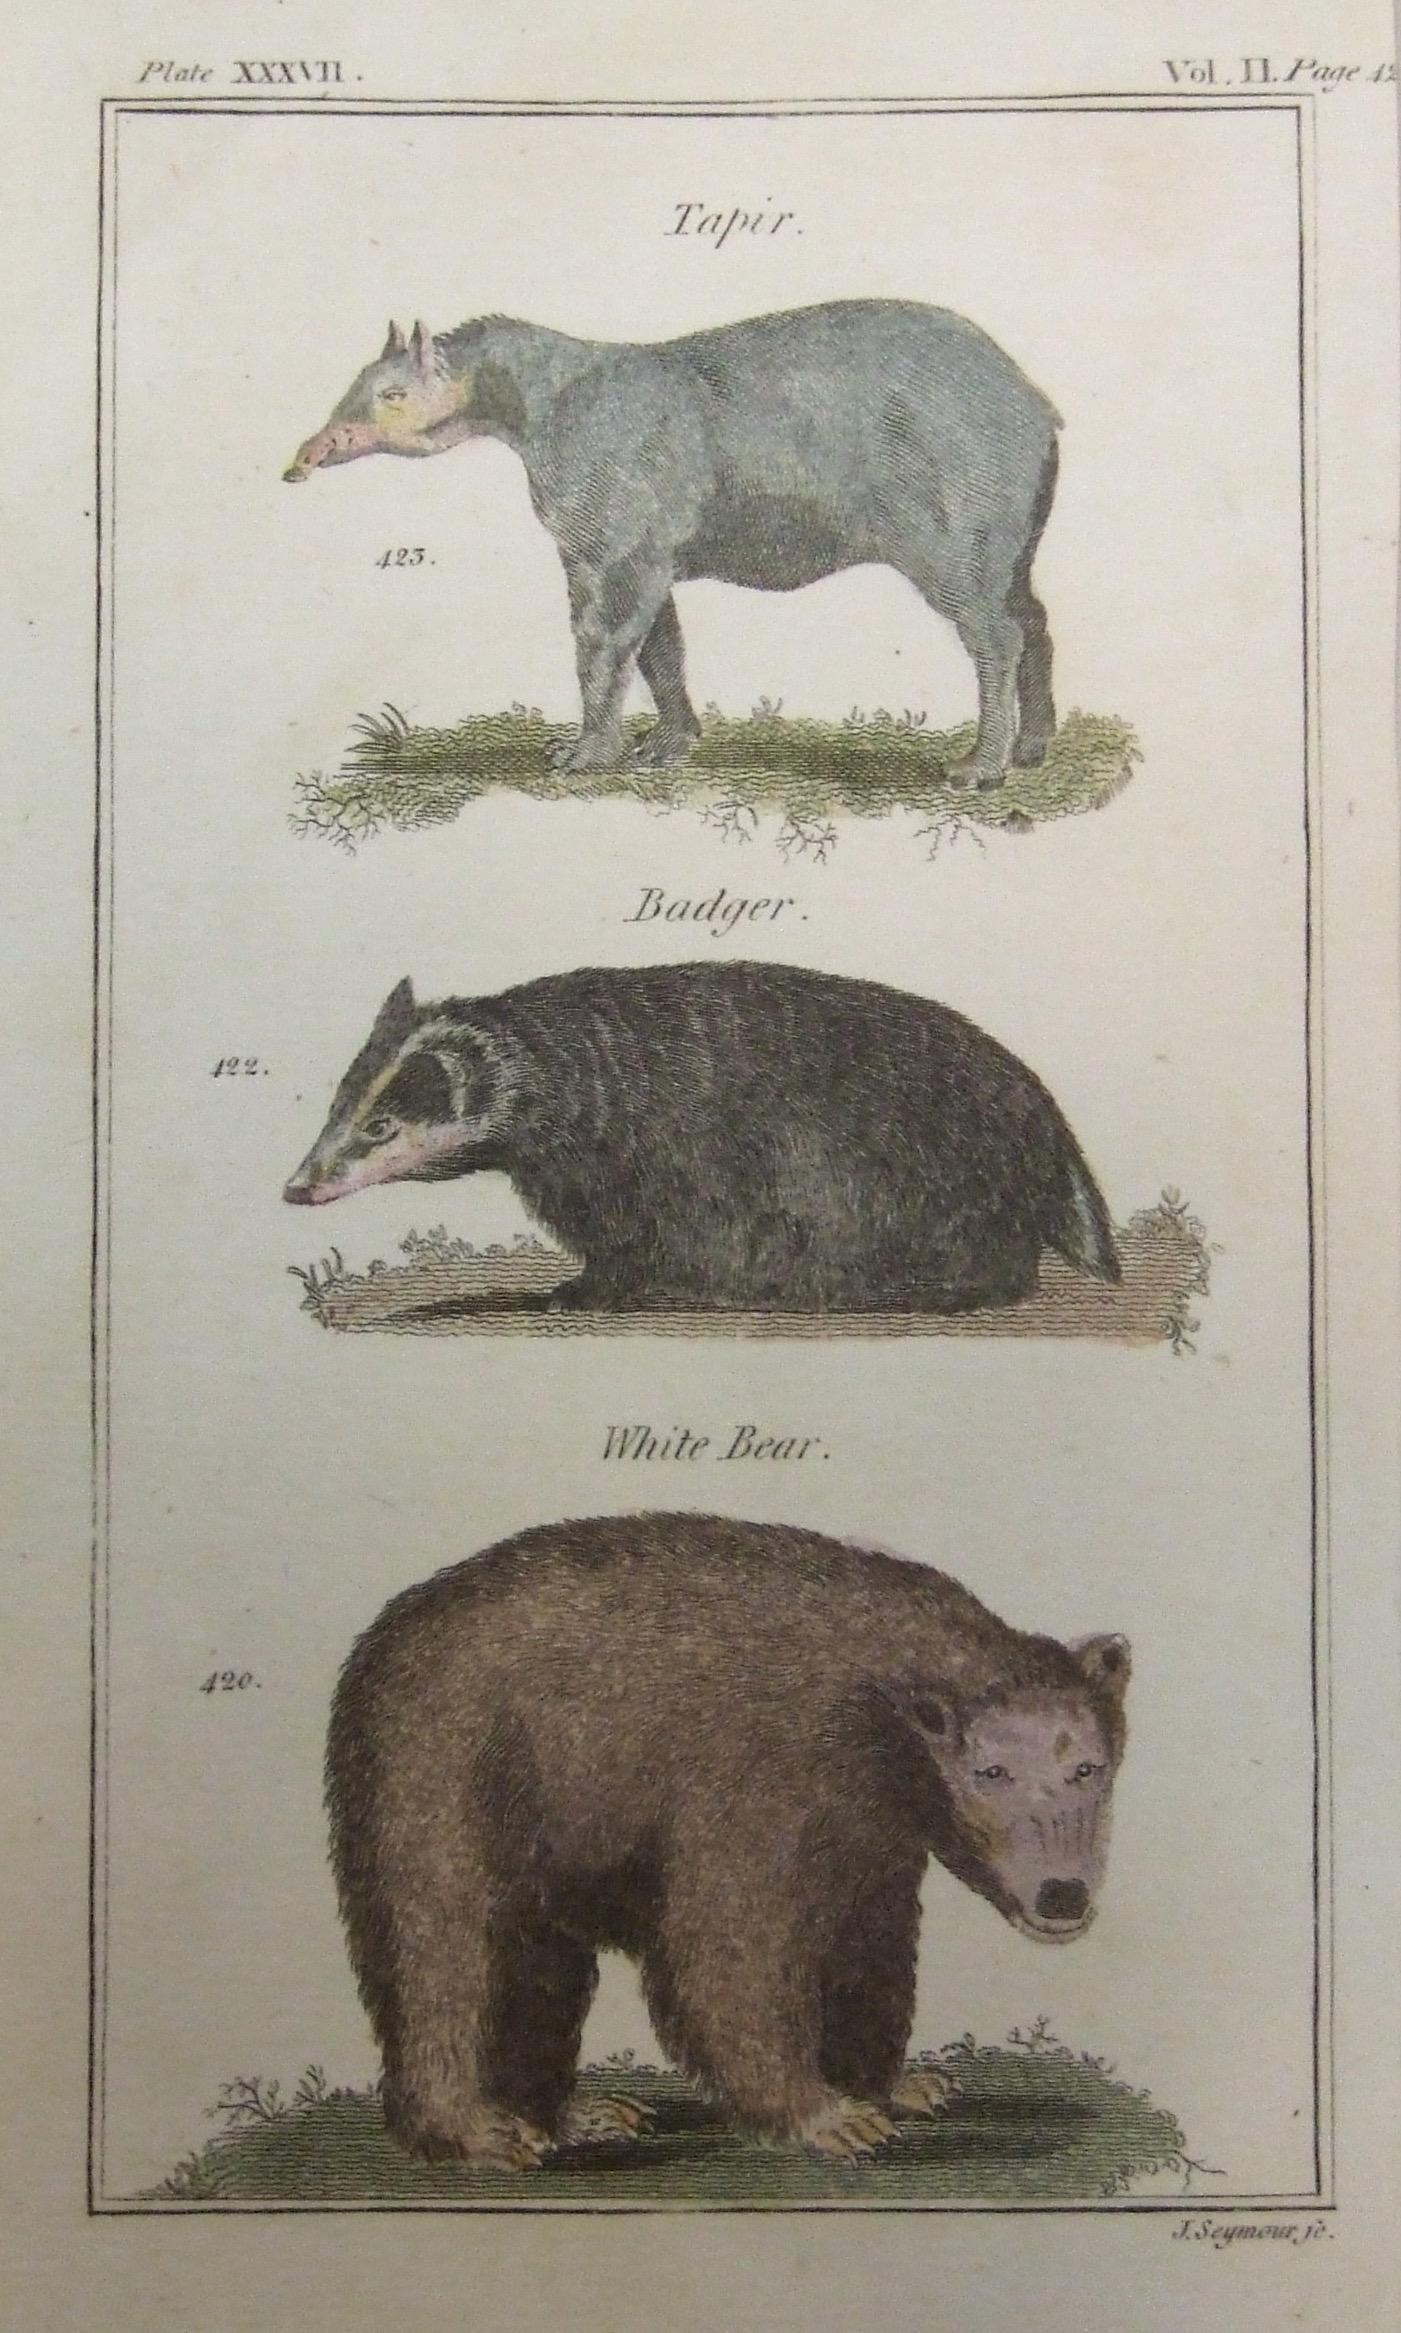 Tapir, Badger, White Bear